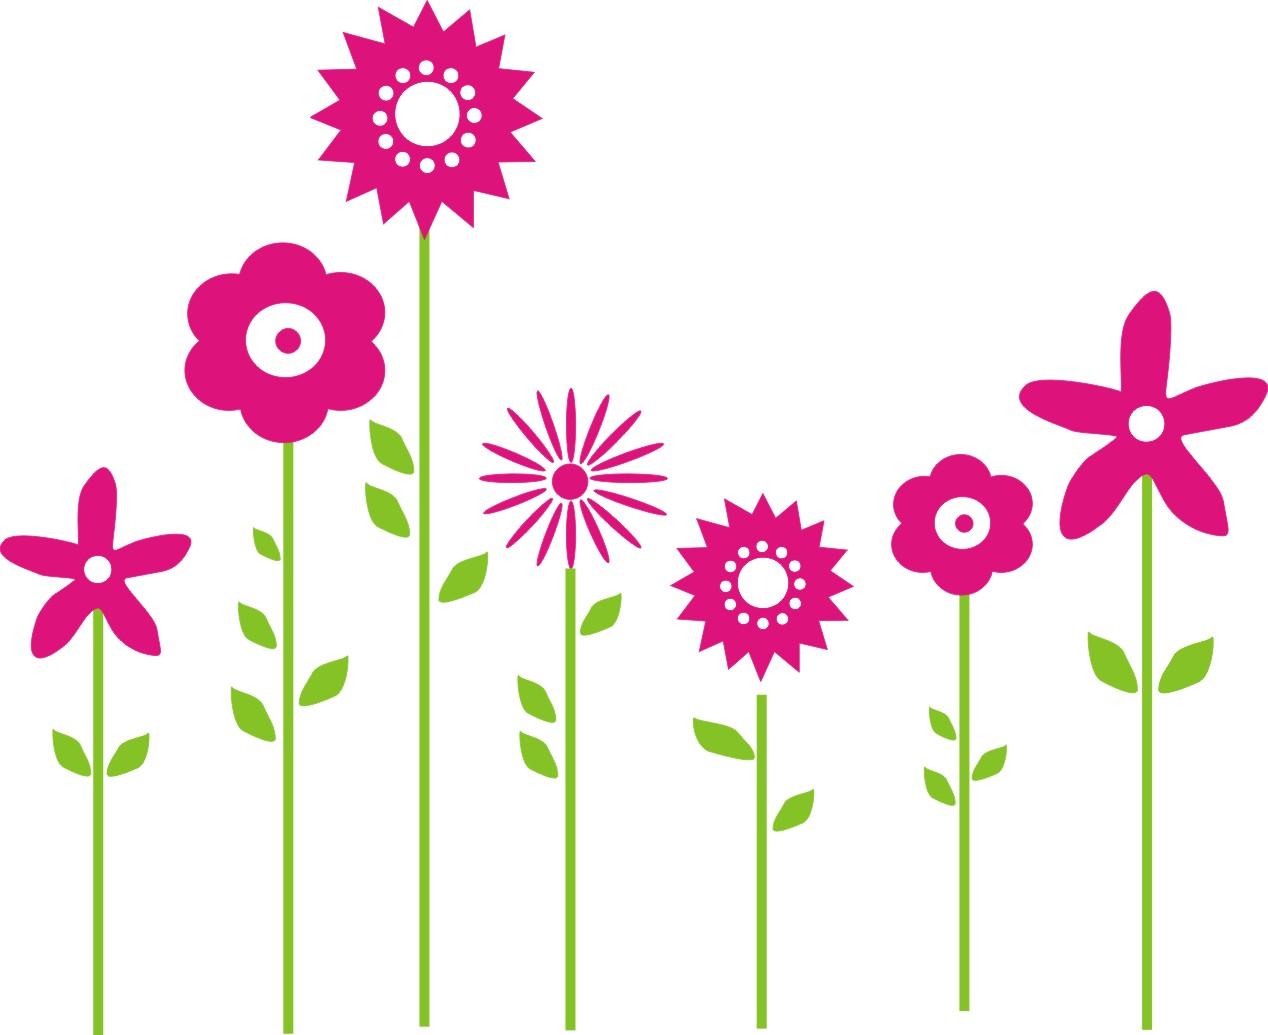 Dibujos De Flores Para Decorar Decoracin Del Hogar Prosalocom